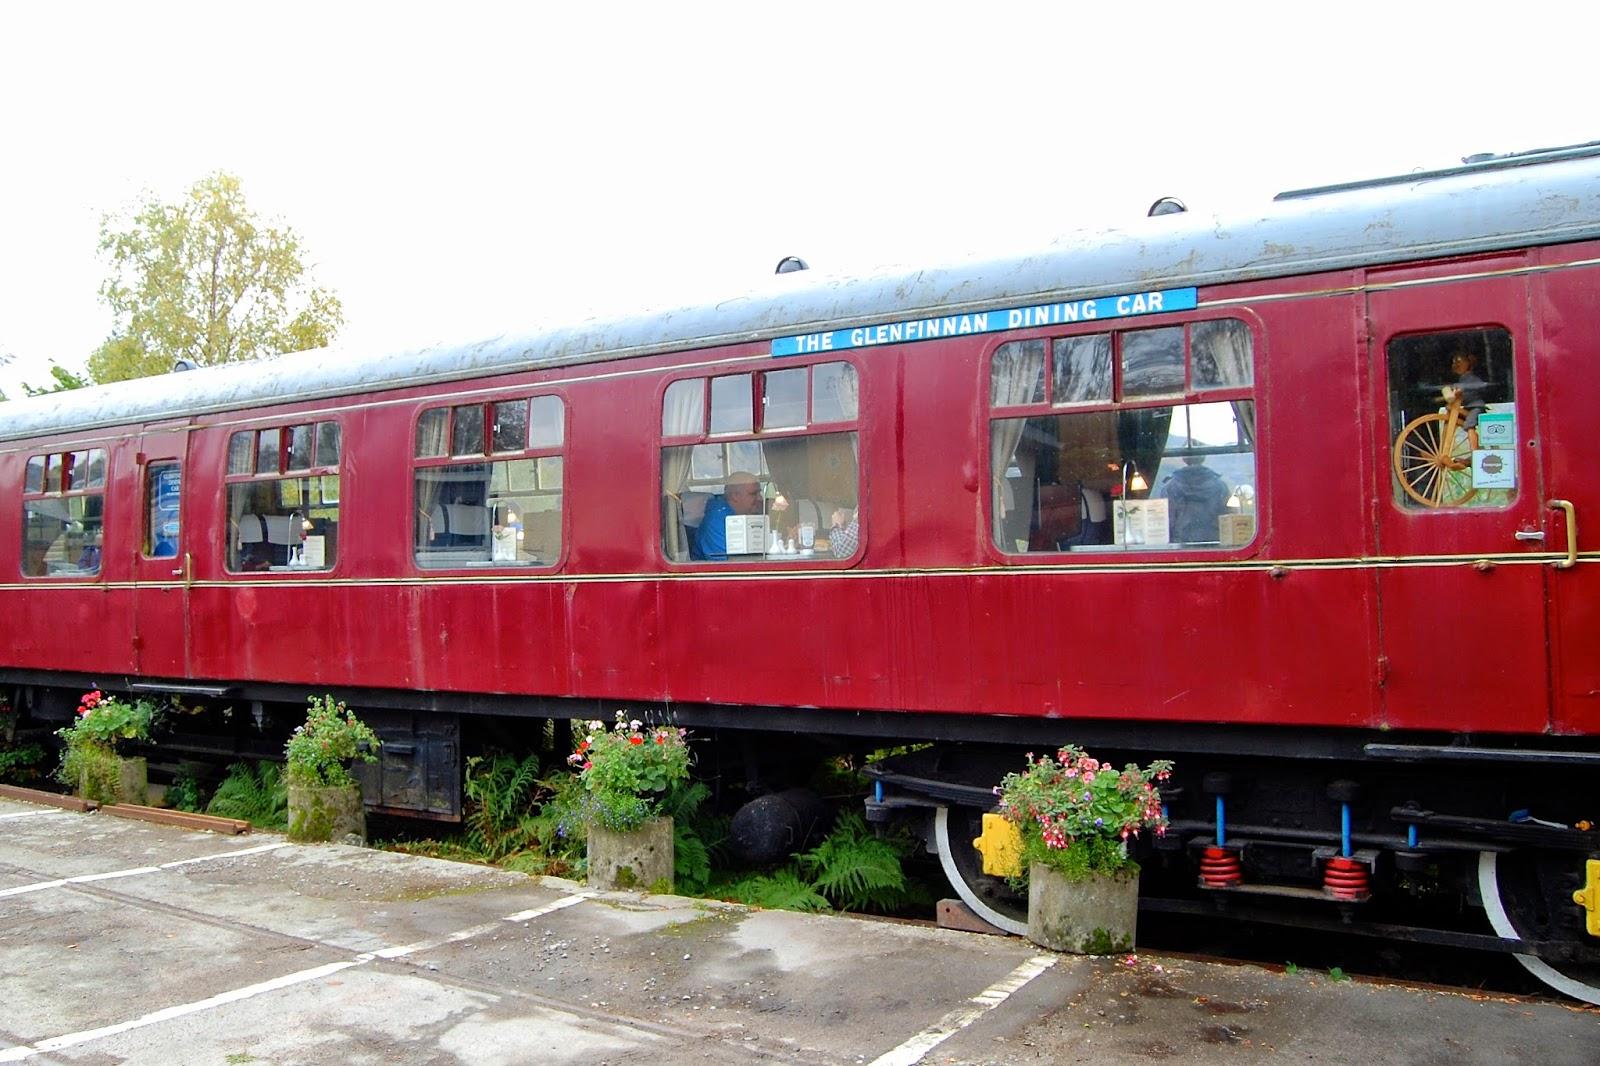 The Glenfinnan Dining Car at the Glenfinnan train station